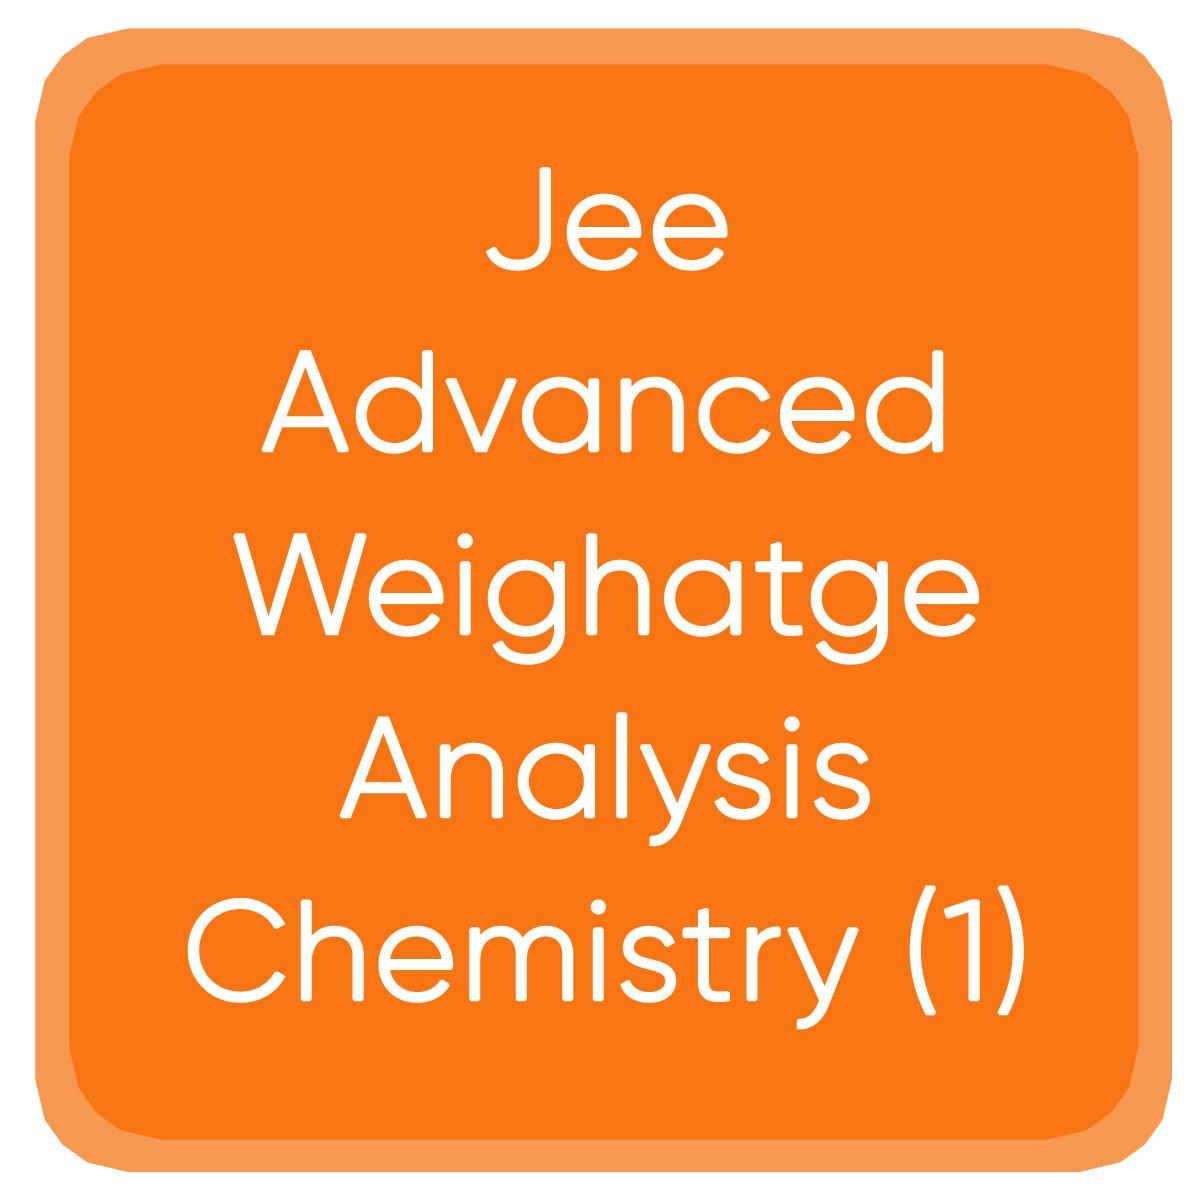 Jee Advanced Weighatge Analysis Chemistry (1)